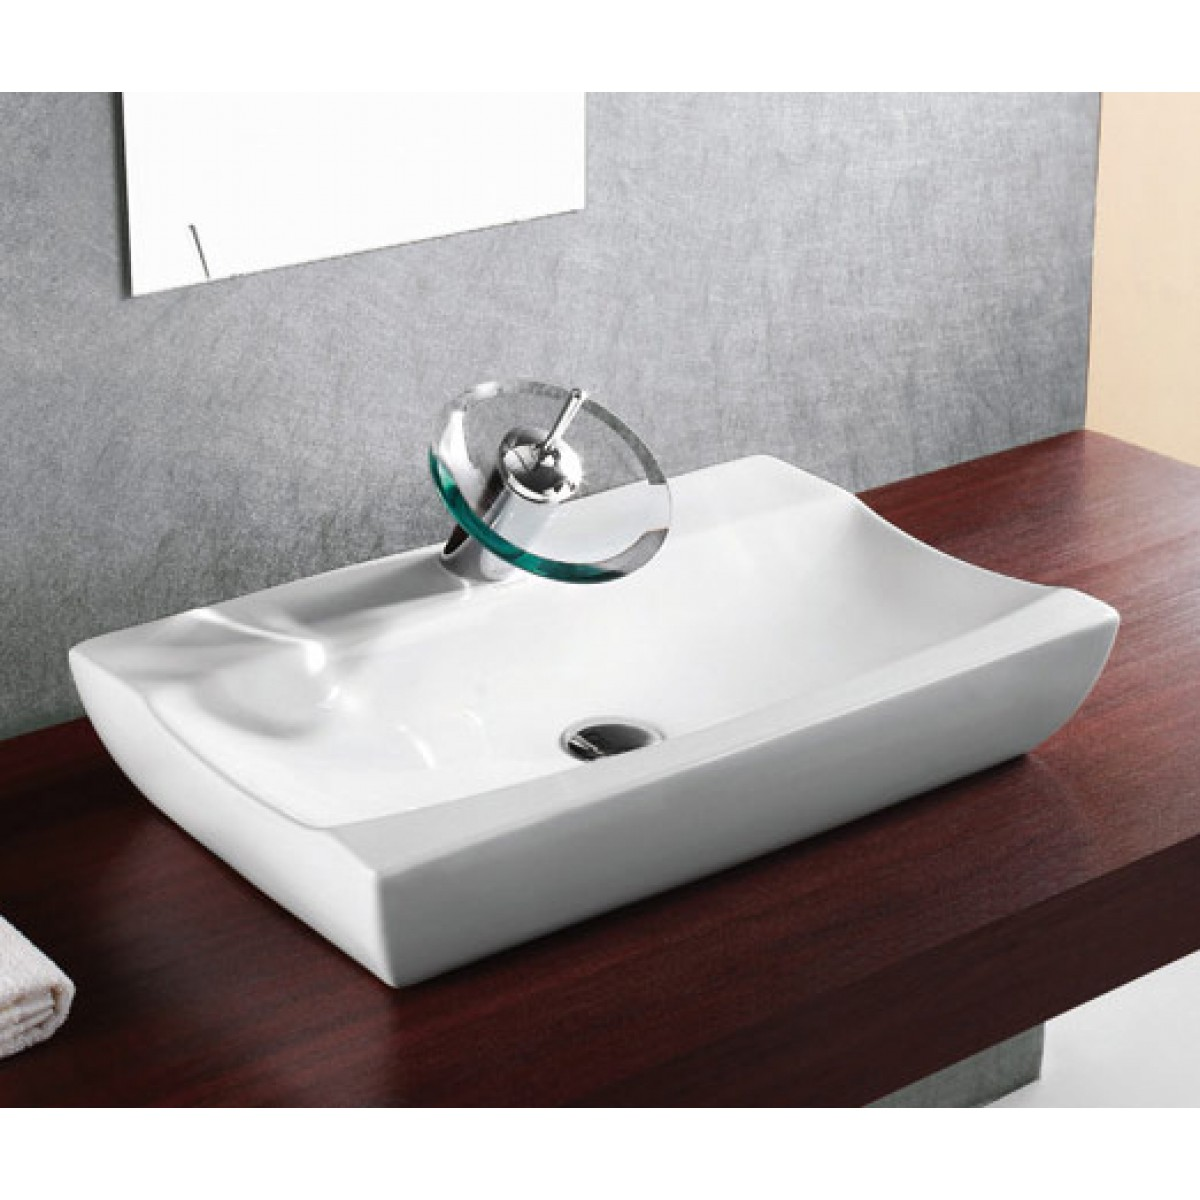 Porcelain Ceramic Single Hole Countertop Bathroom Vessel ...